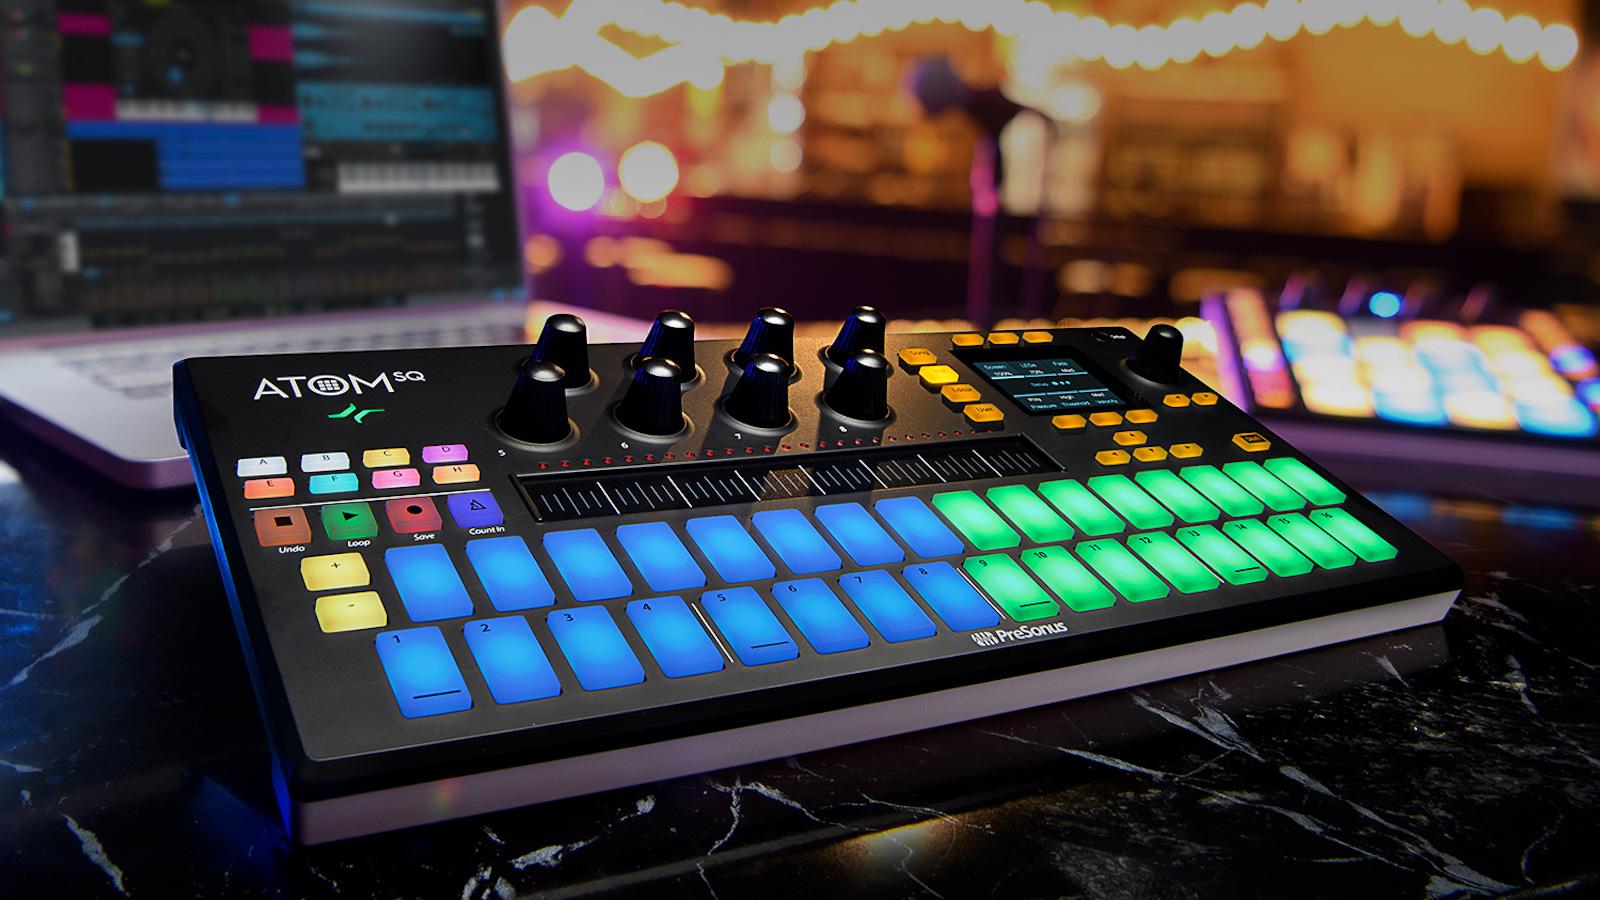 PreSonus ATOM SQ hybrid MIDI keyboard is a versatile pad controller for music production